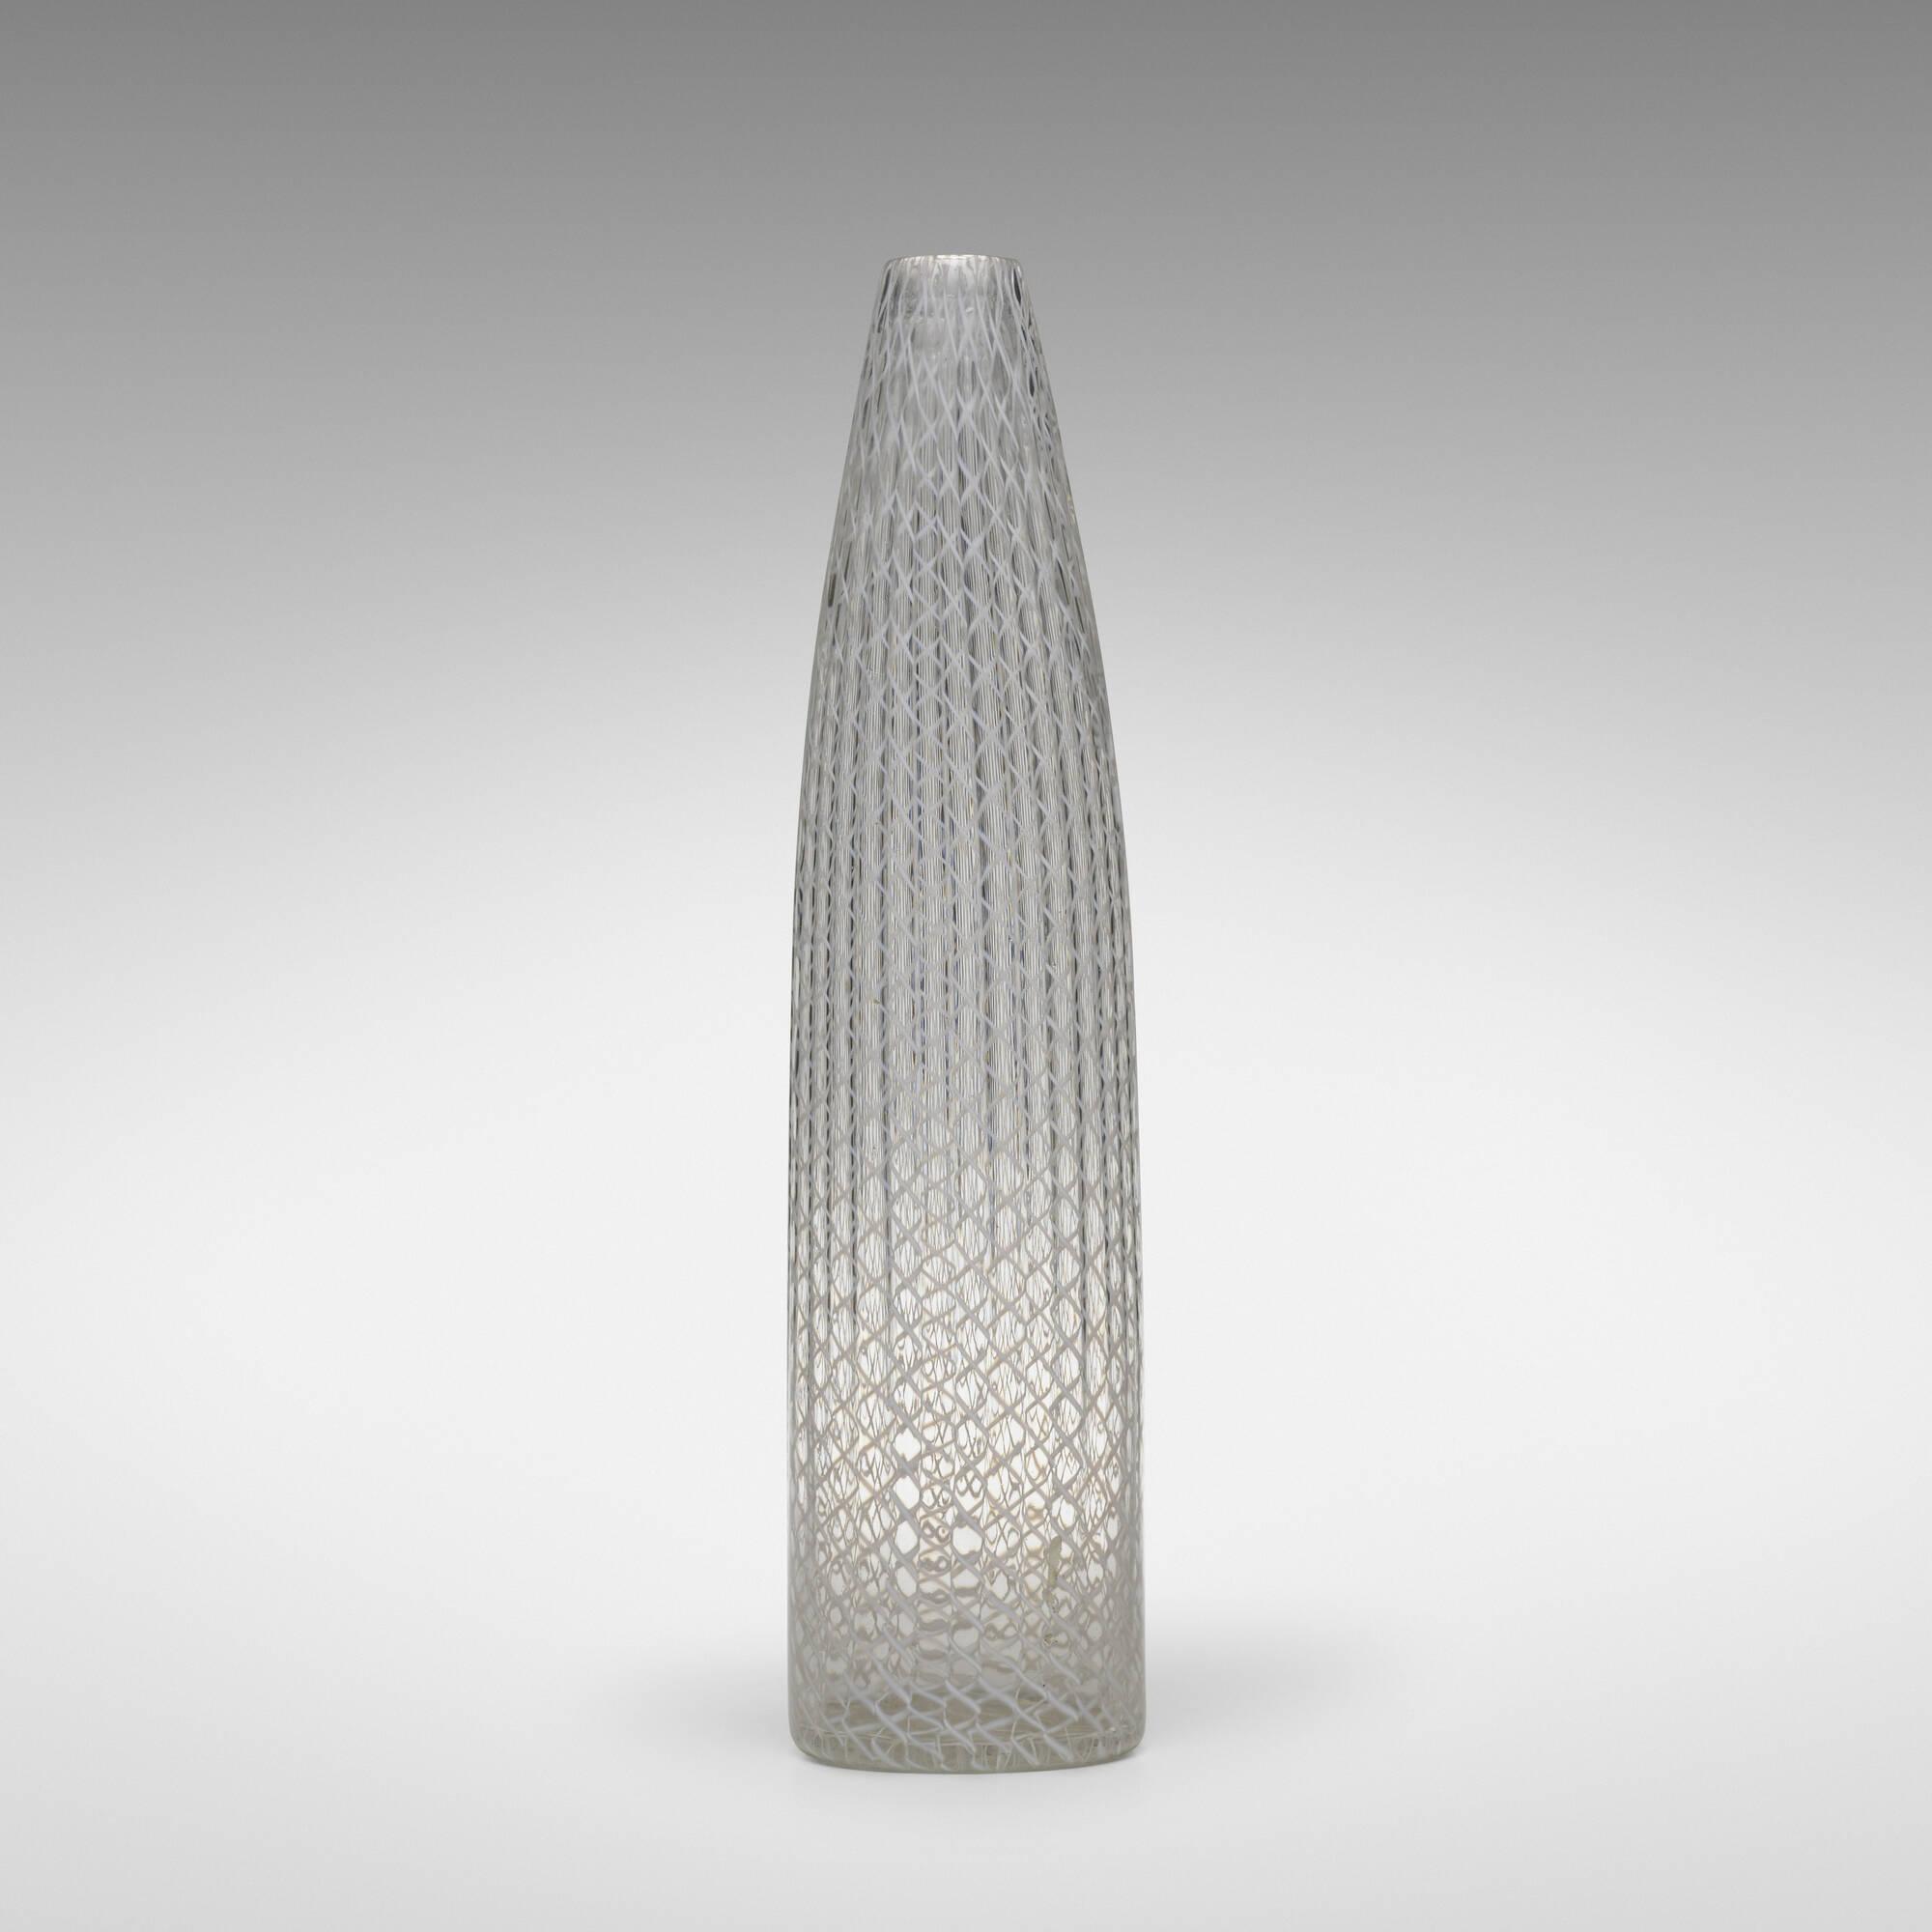 155: Paolo Venini / Zanfirico vase, model 3883 (1 of 2)